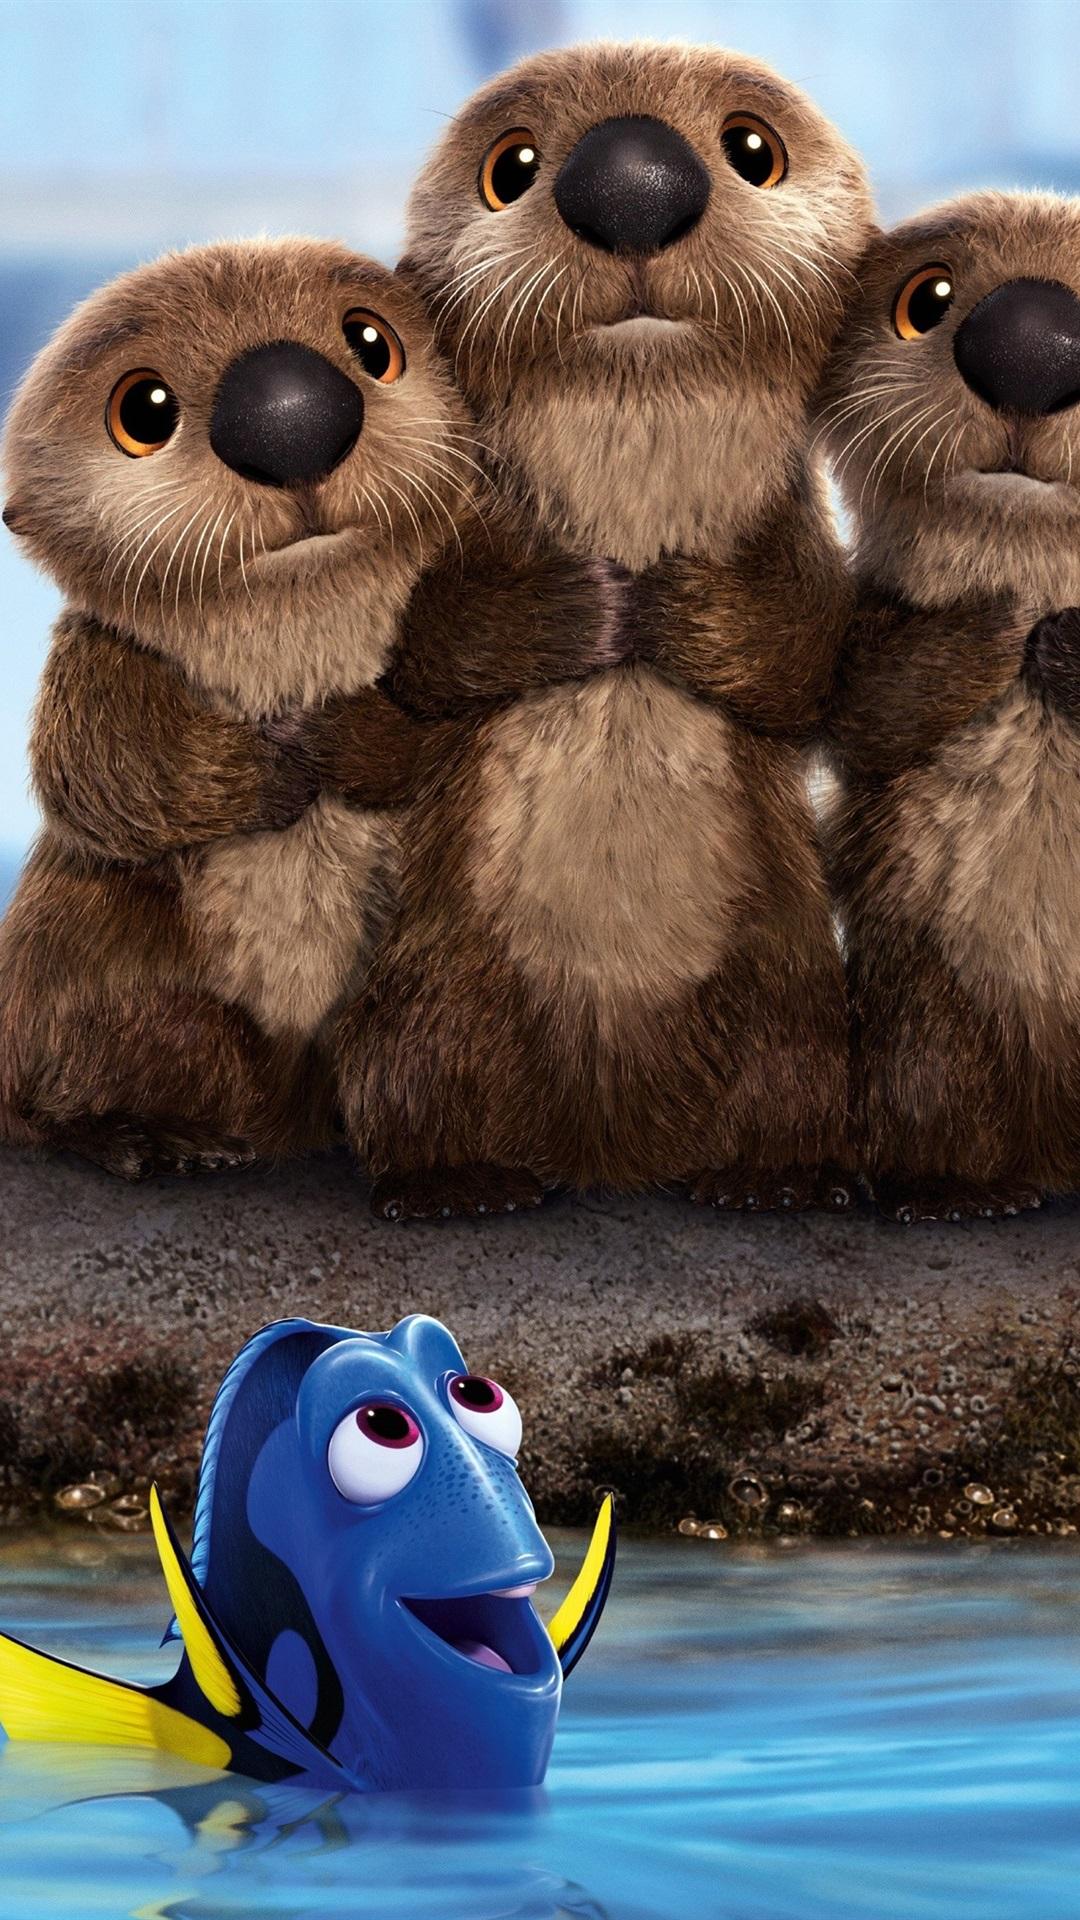 Finding Dory Cute Beavers 1080x1920 Iphone 8 7 6 6s Plus